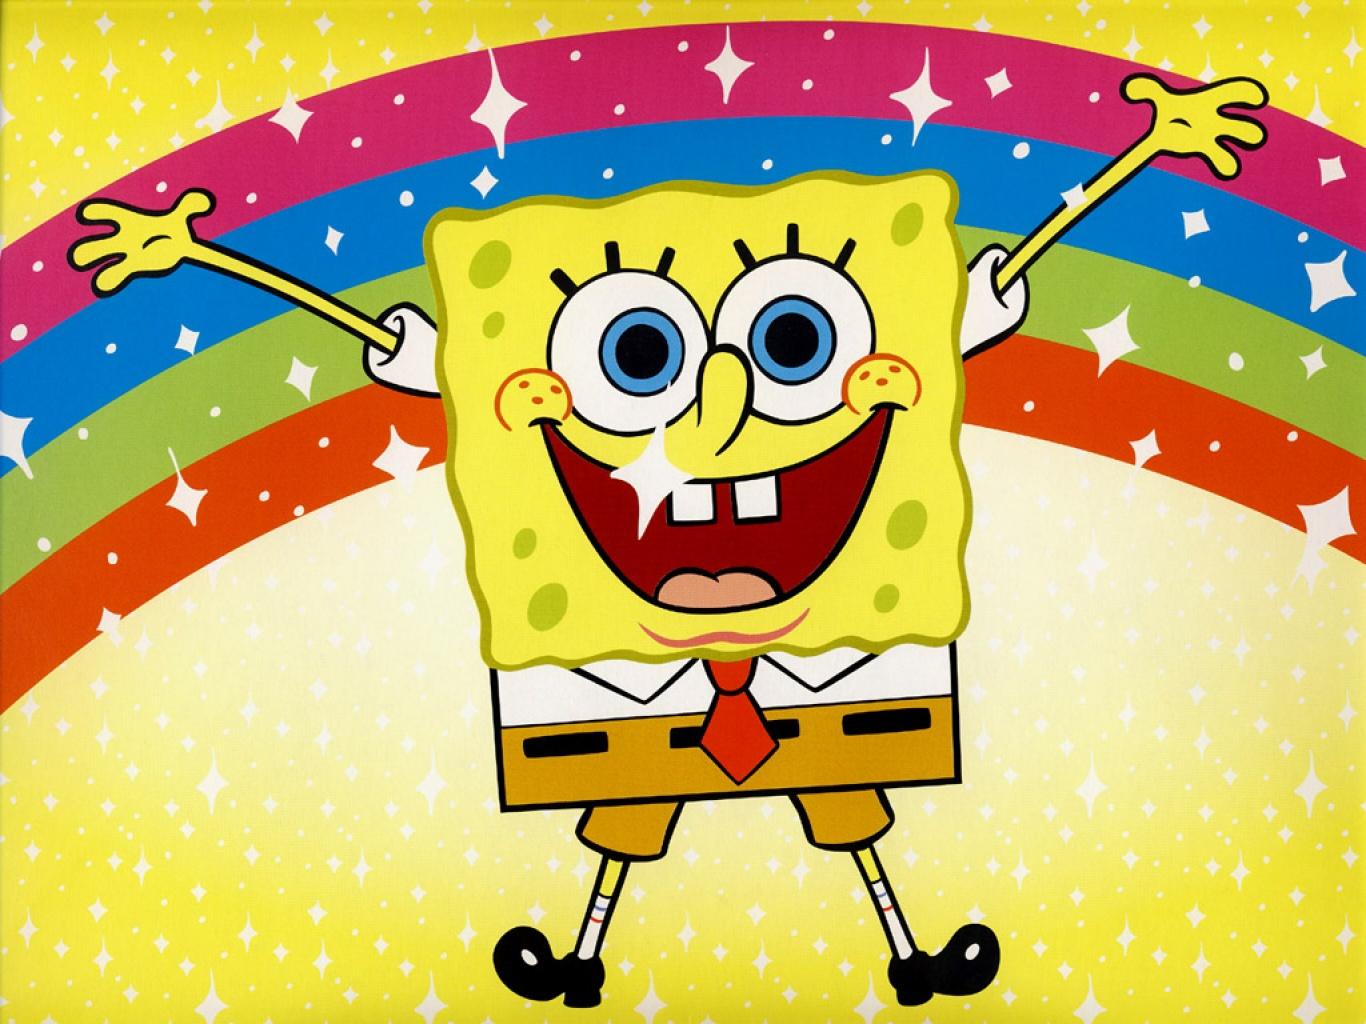 Free Download Spongebob Wallpaper Hd Background 1366x1024 For Your Desktop Mobile Tablet Explore 73 Spongebob Desktop Wallpaper Spongebob Squarepants Wallpaper Spongebob Hd Wallpaper Spongebob Screensavers And Wallpaper